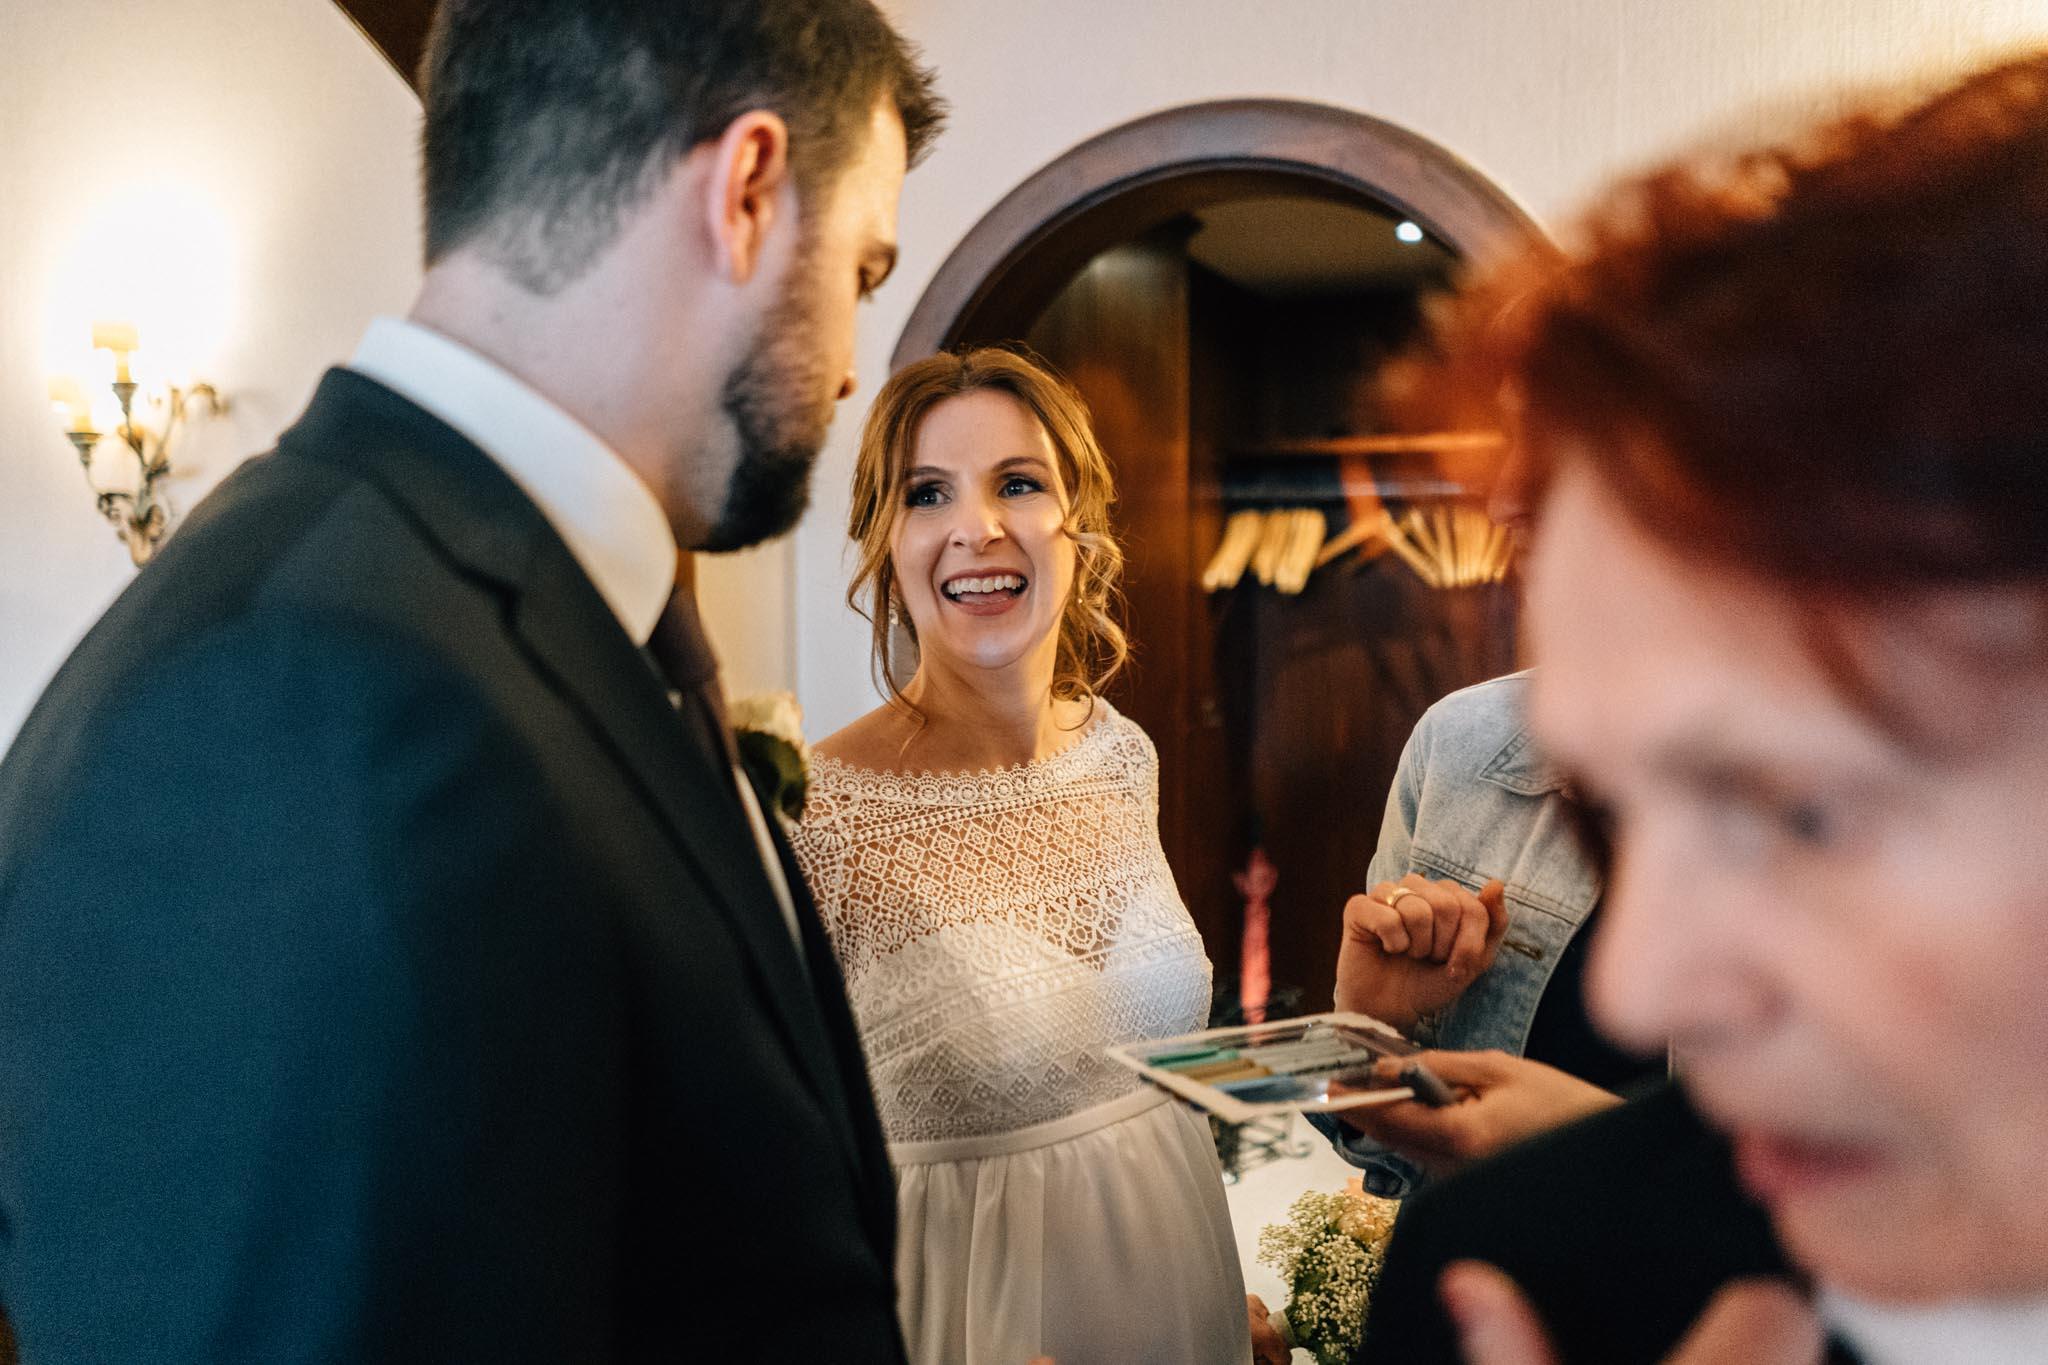 Hochzeit Alter Krug Helpup, Feier Alter Krug Helpup